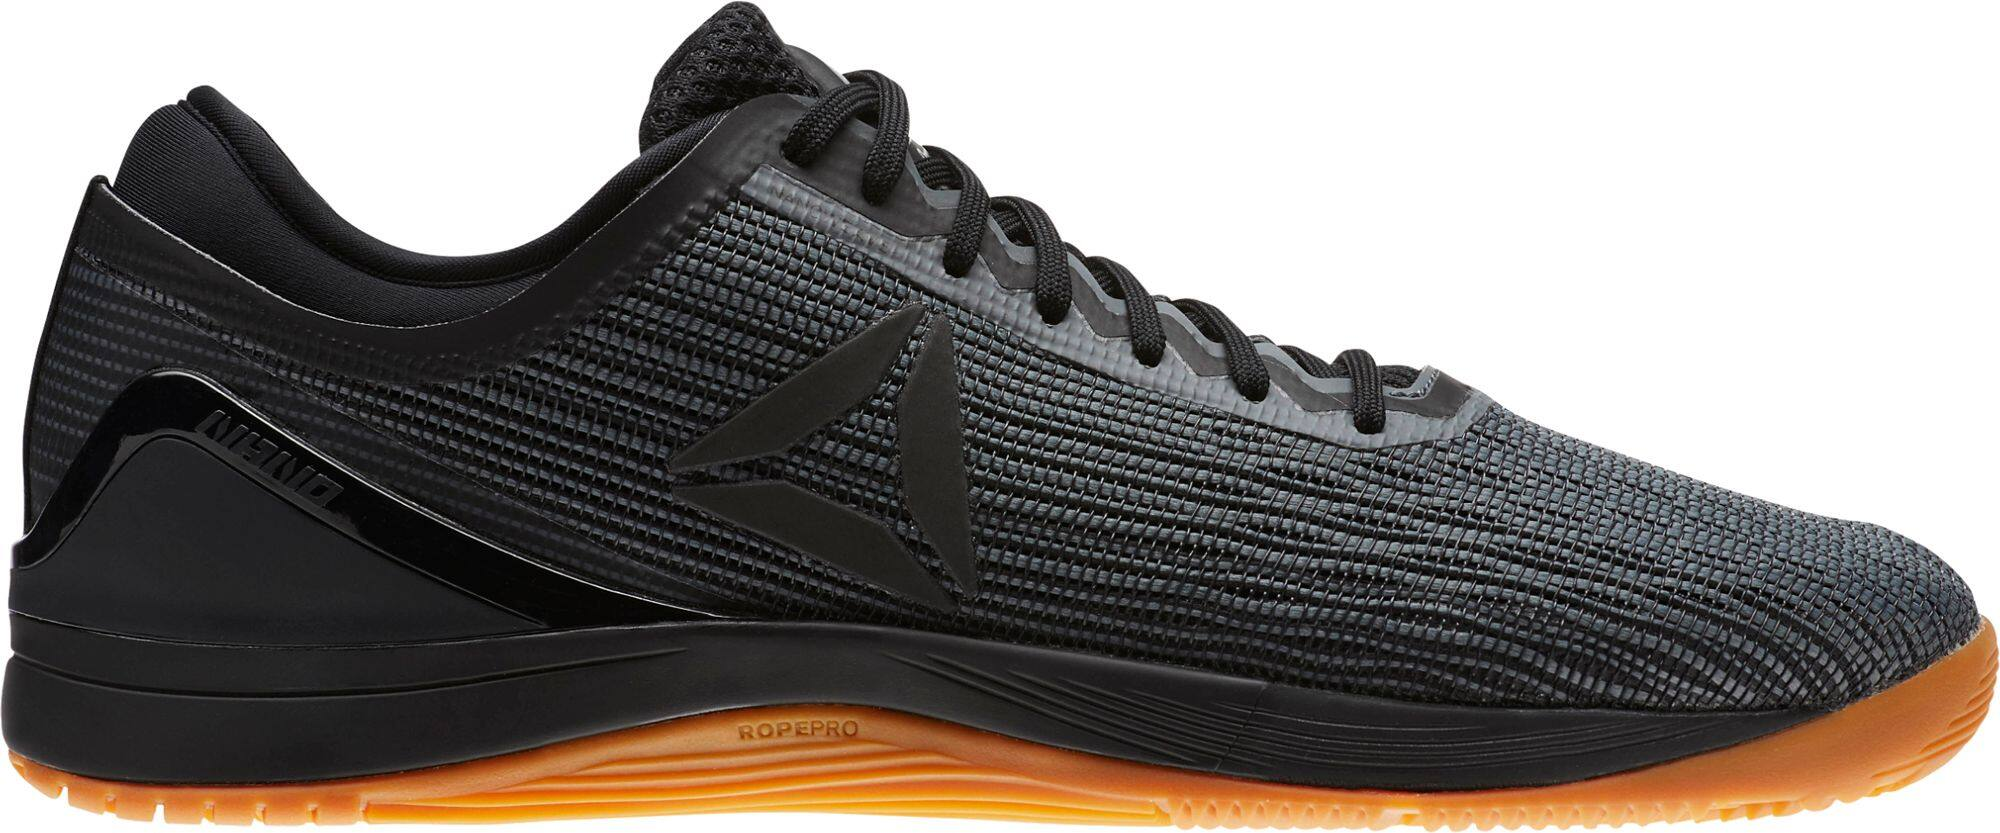 104b61bafb0be4 Reebok Men s CrossFit Nano 8.0 Flexweave Training Shoes  30 ...